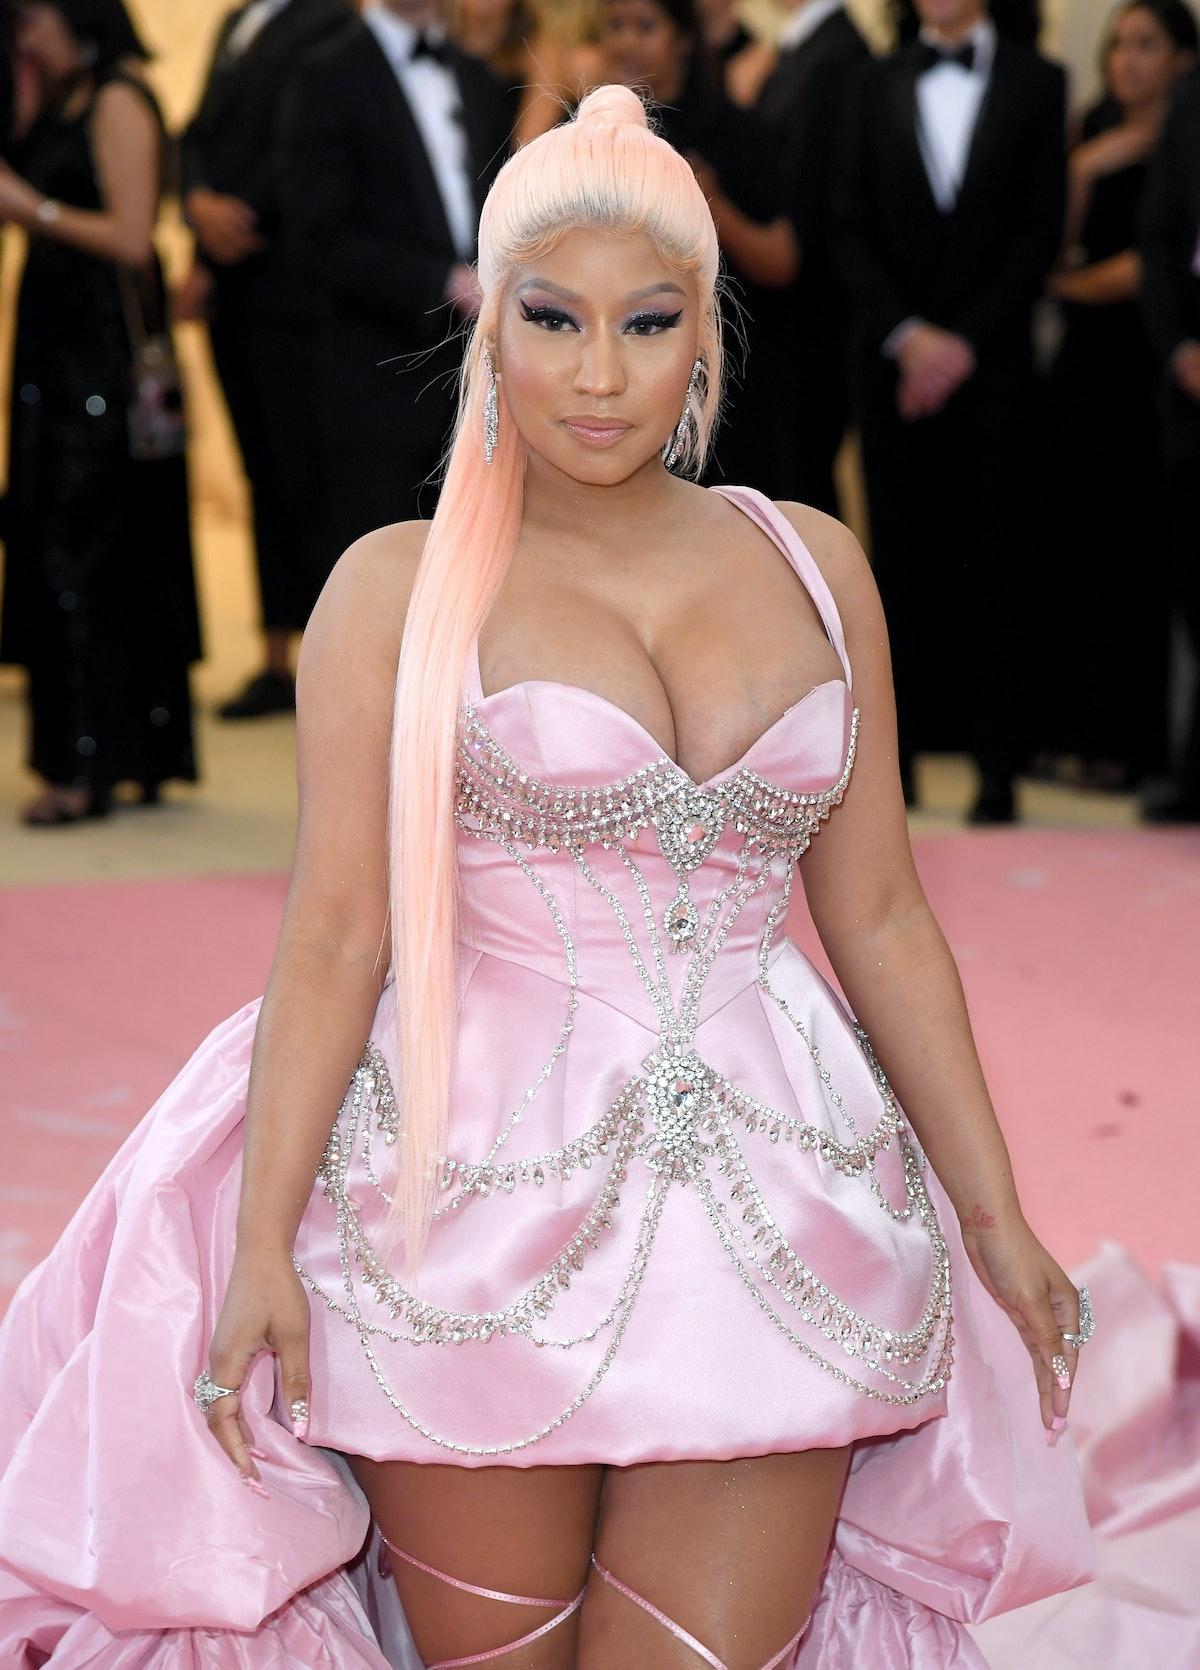 Nicki Minaj attends the Met Gala.